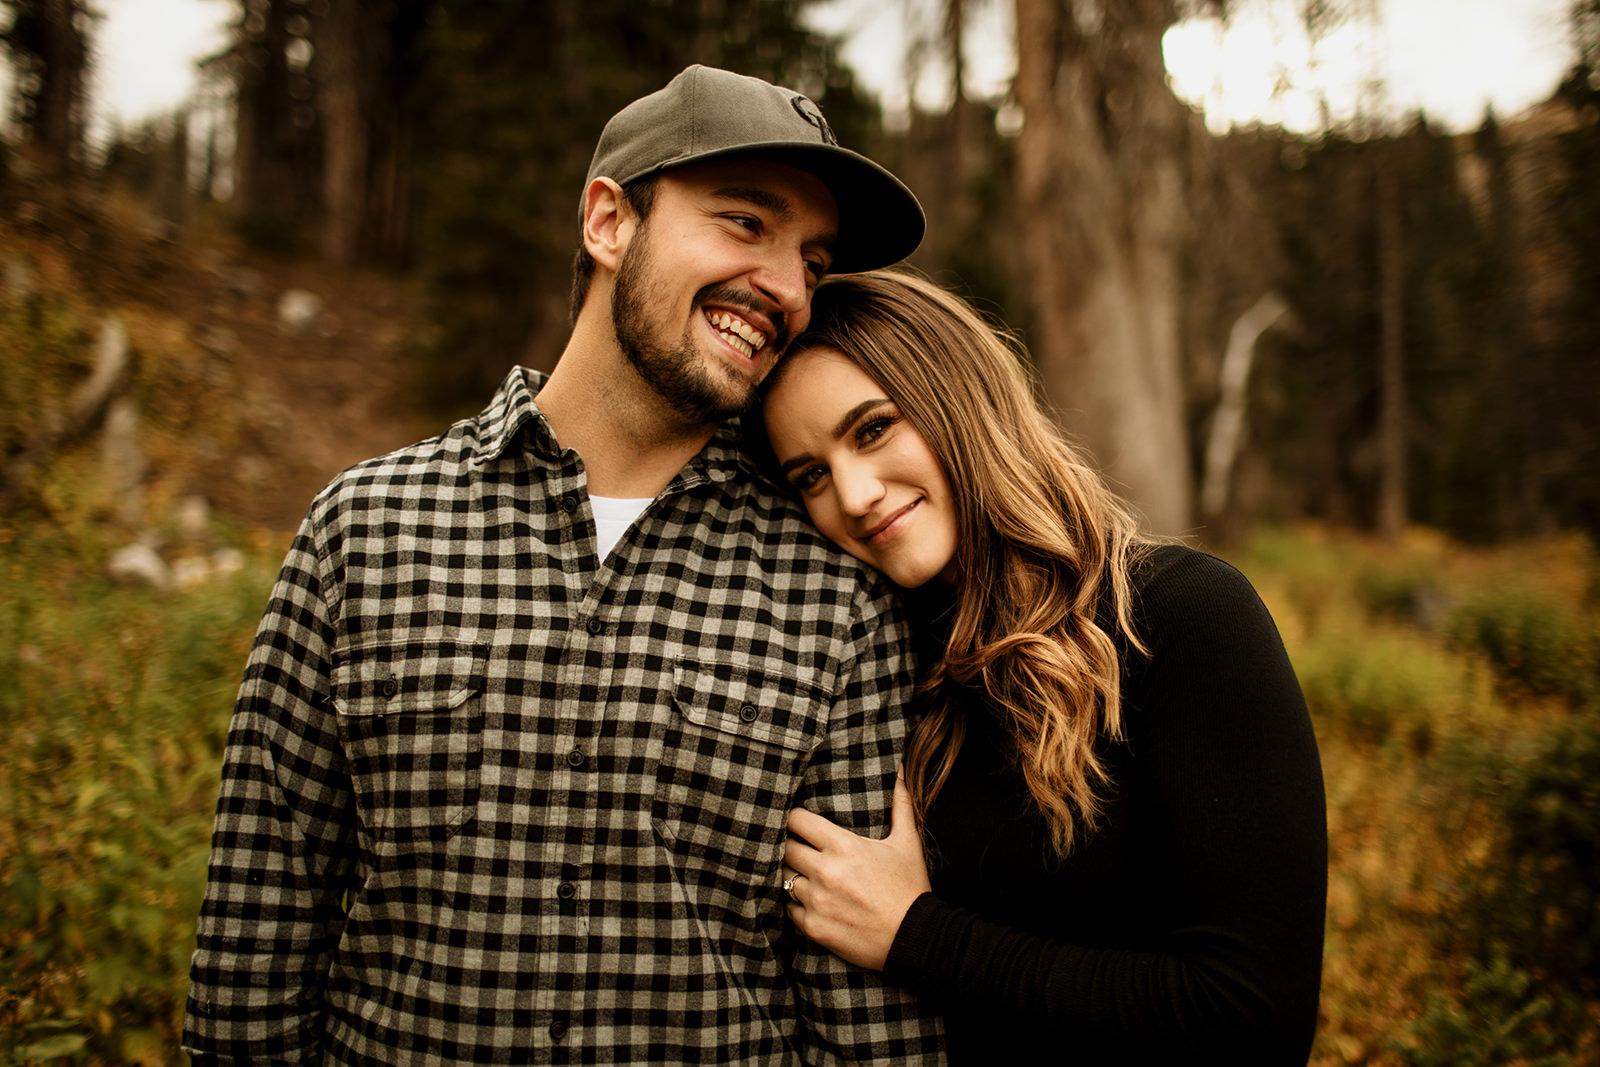 Liz Osban Photography Cheyenne Wyoming Engagement Wedding Photographer couple adventure elopement wedding laramie denver fort collins colorado rocky mountain national park8.jpg